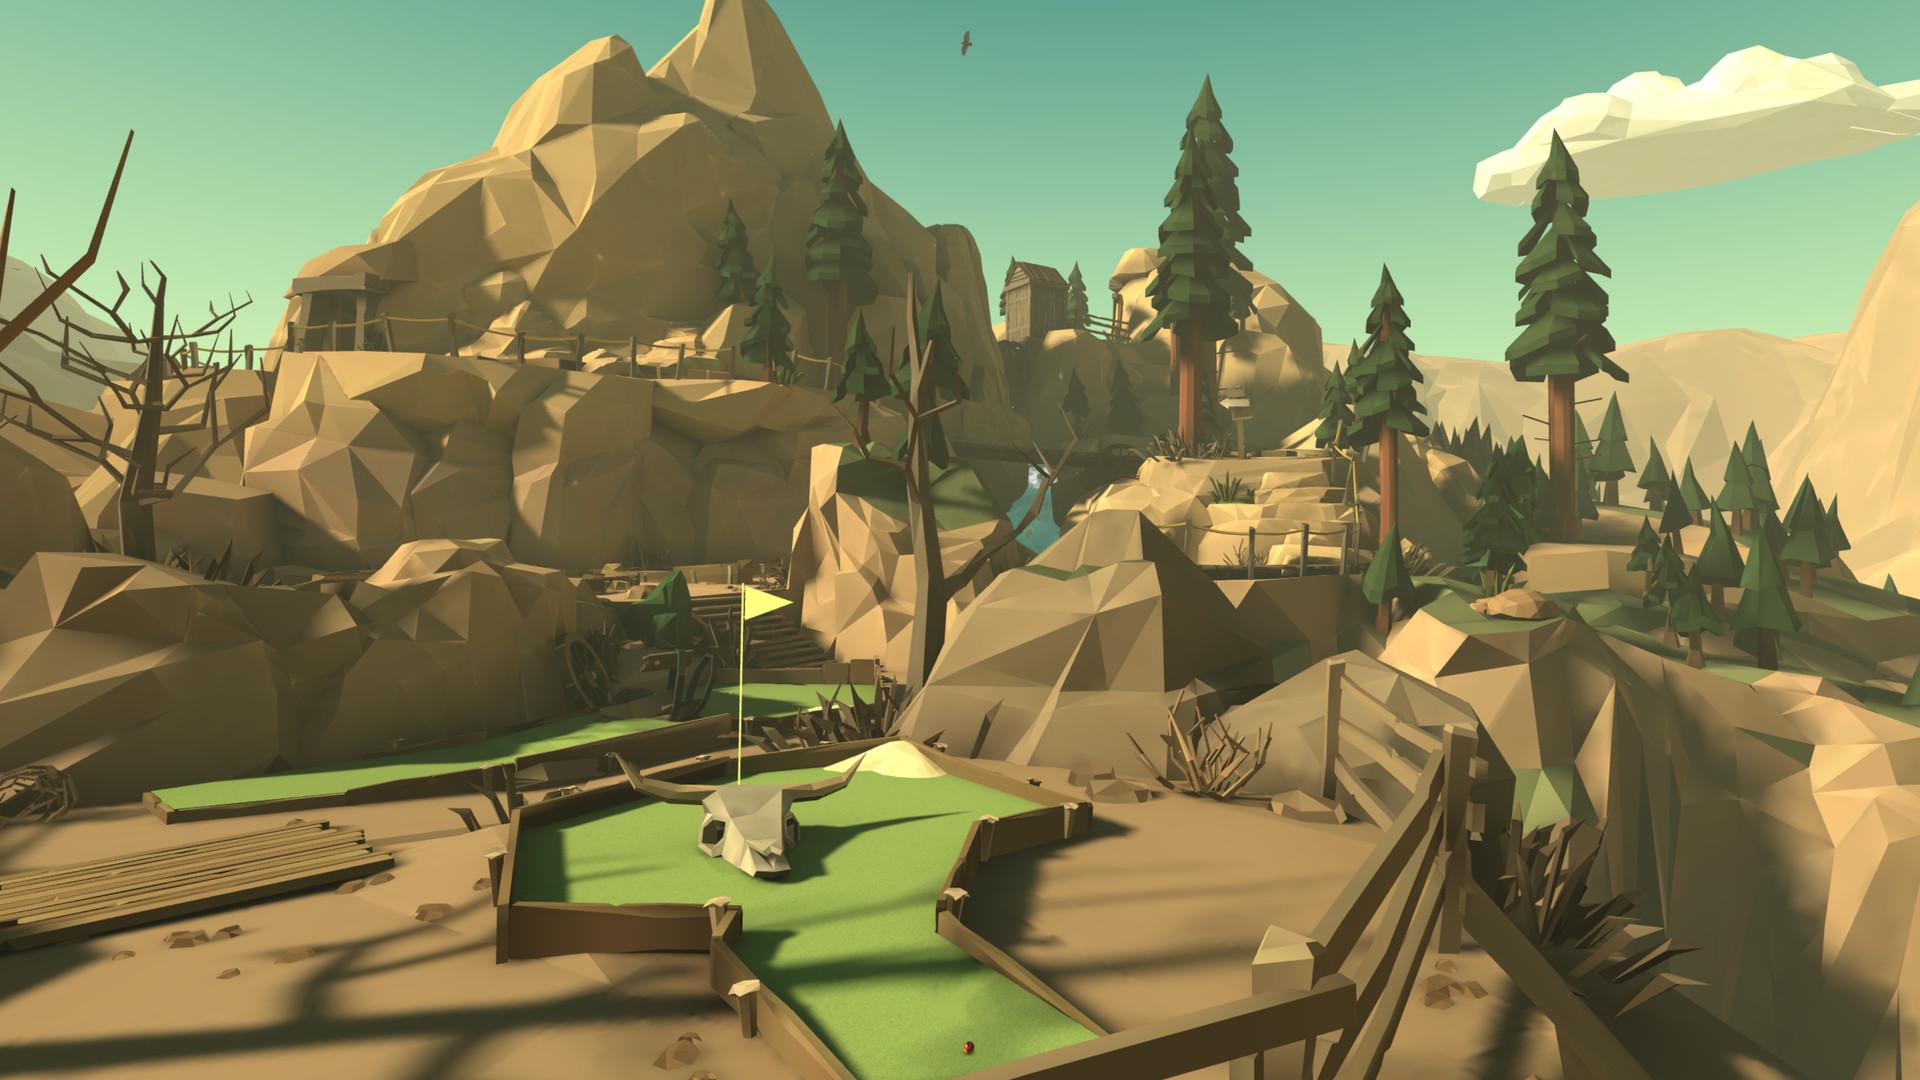 walkabout-mini-golf-vr-pc-screenshot-2